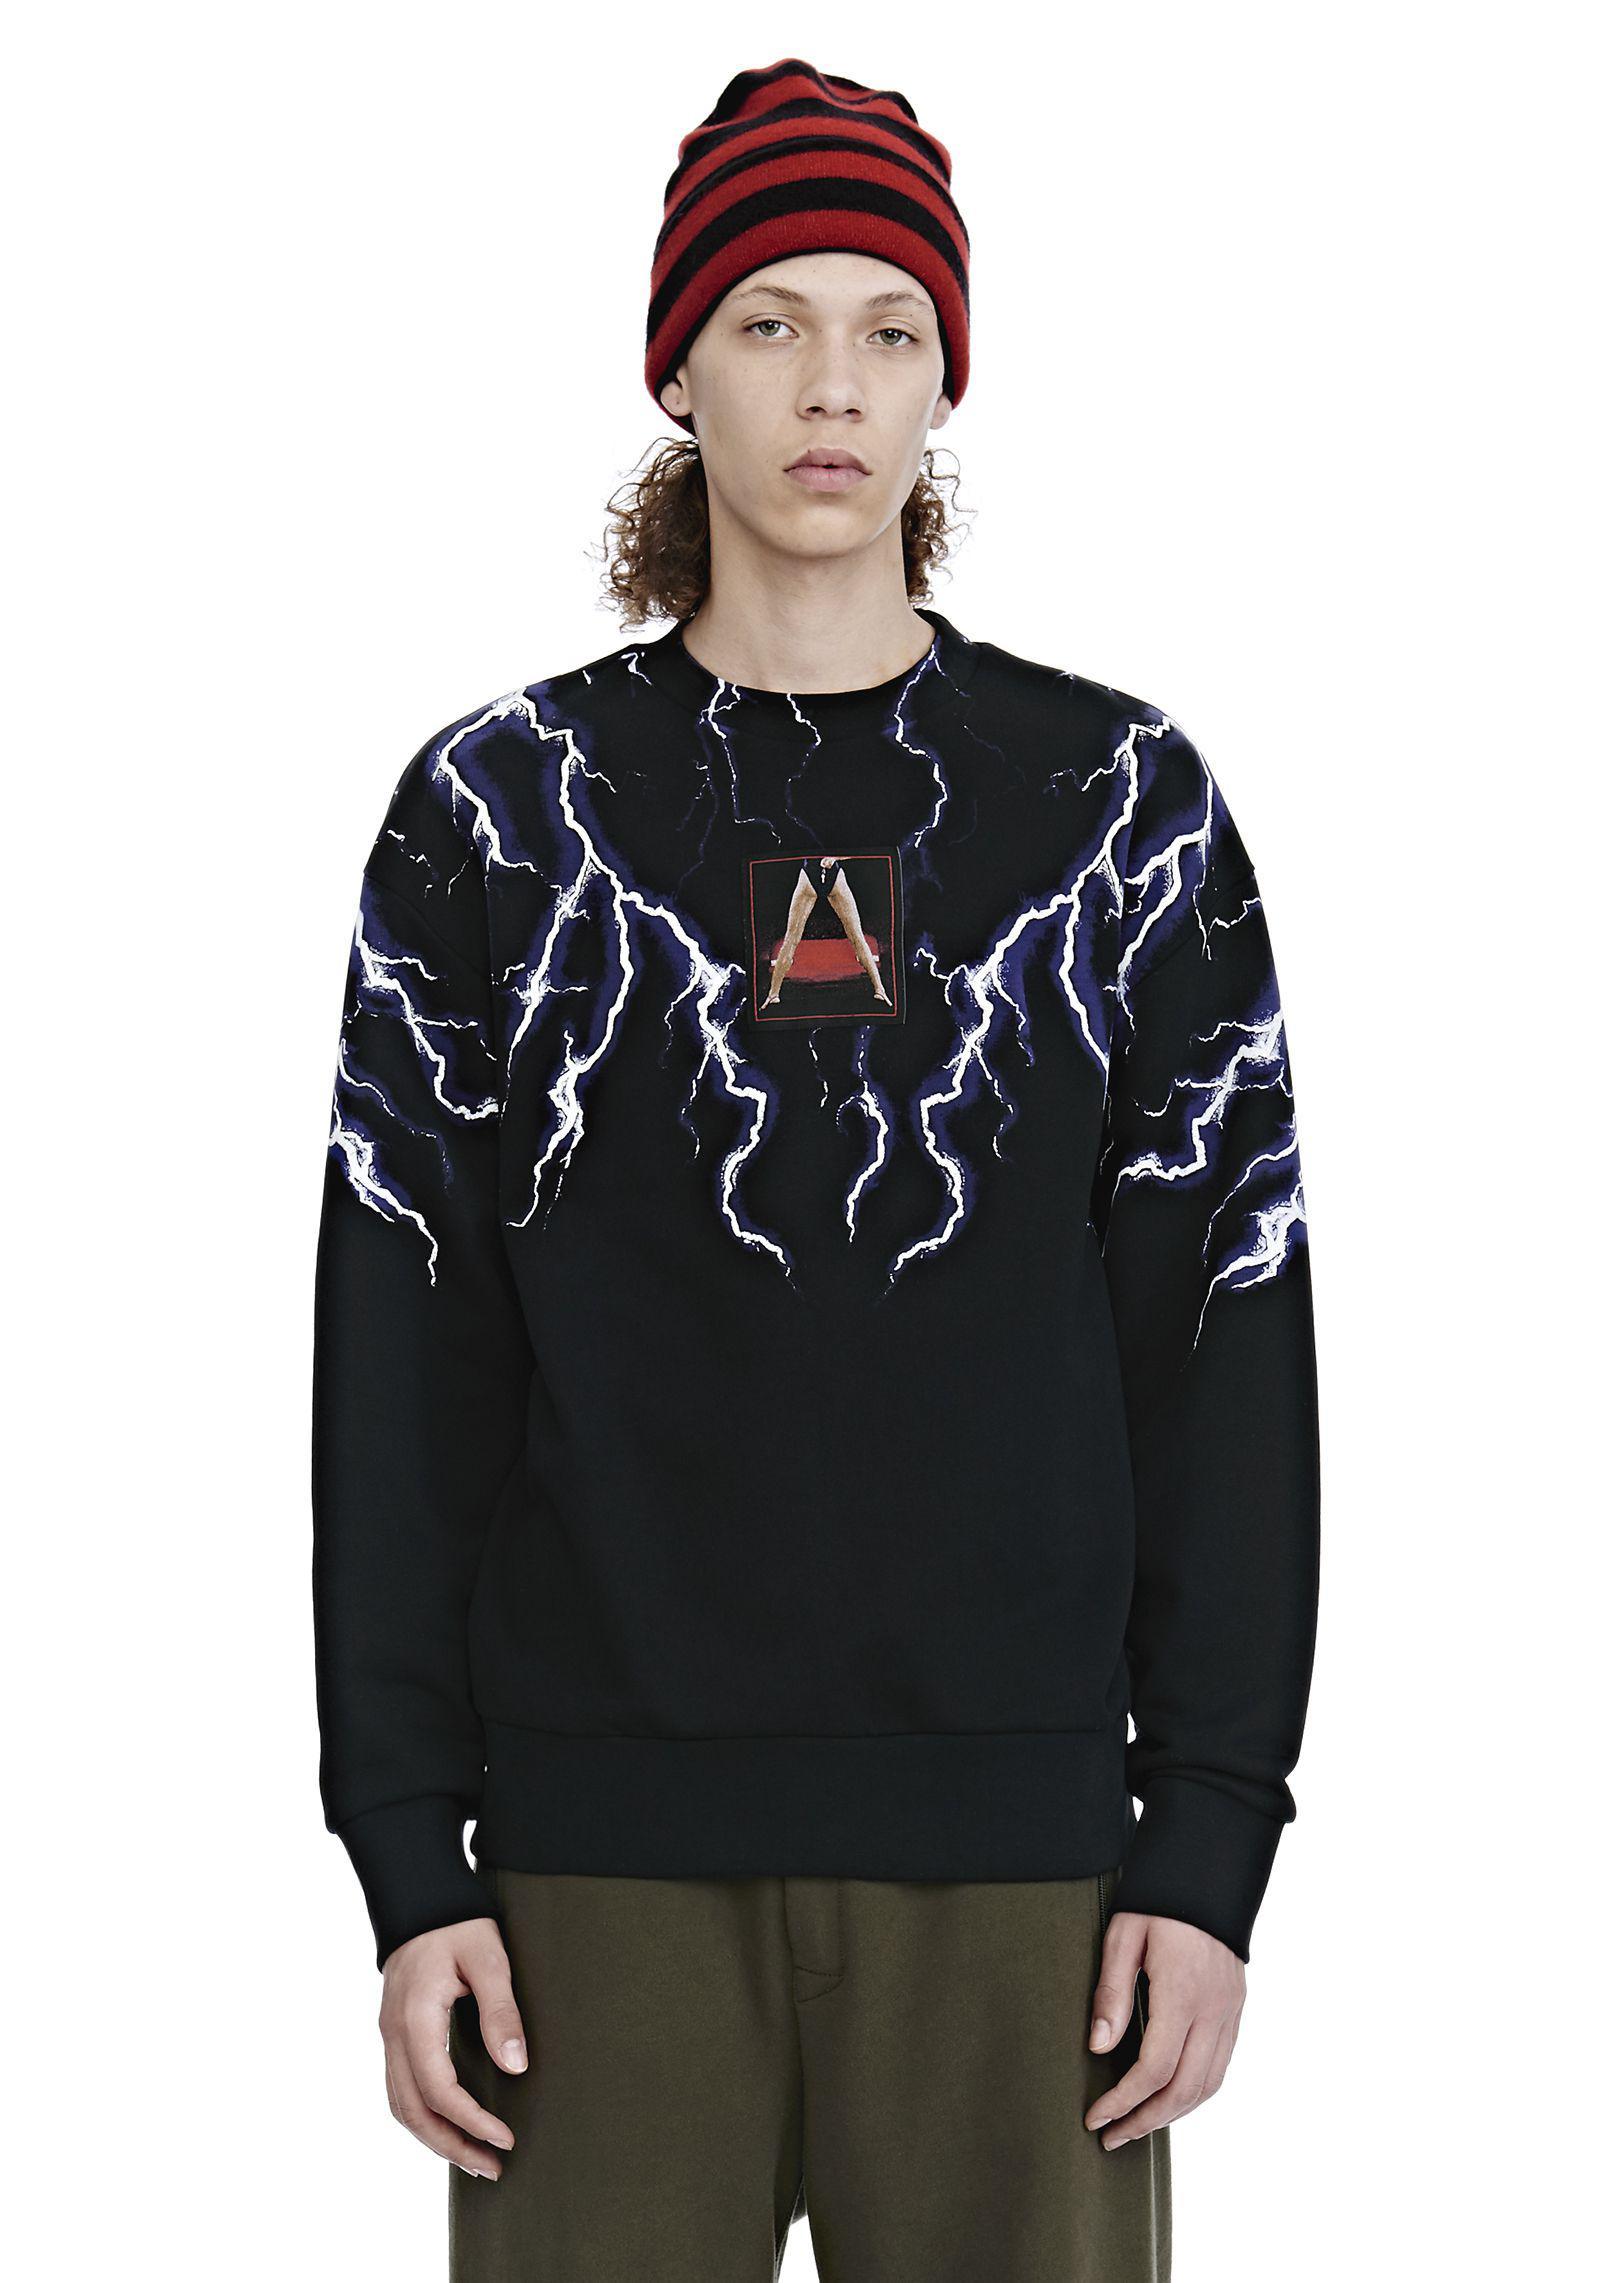 27536980 Alexander Wang Lightning Collage Sweatshirt in Black for Men - Lyst